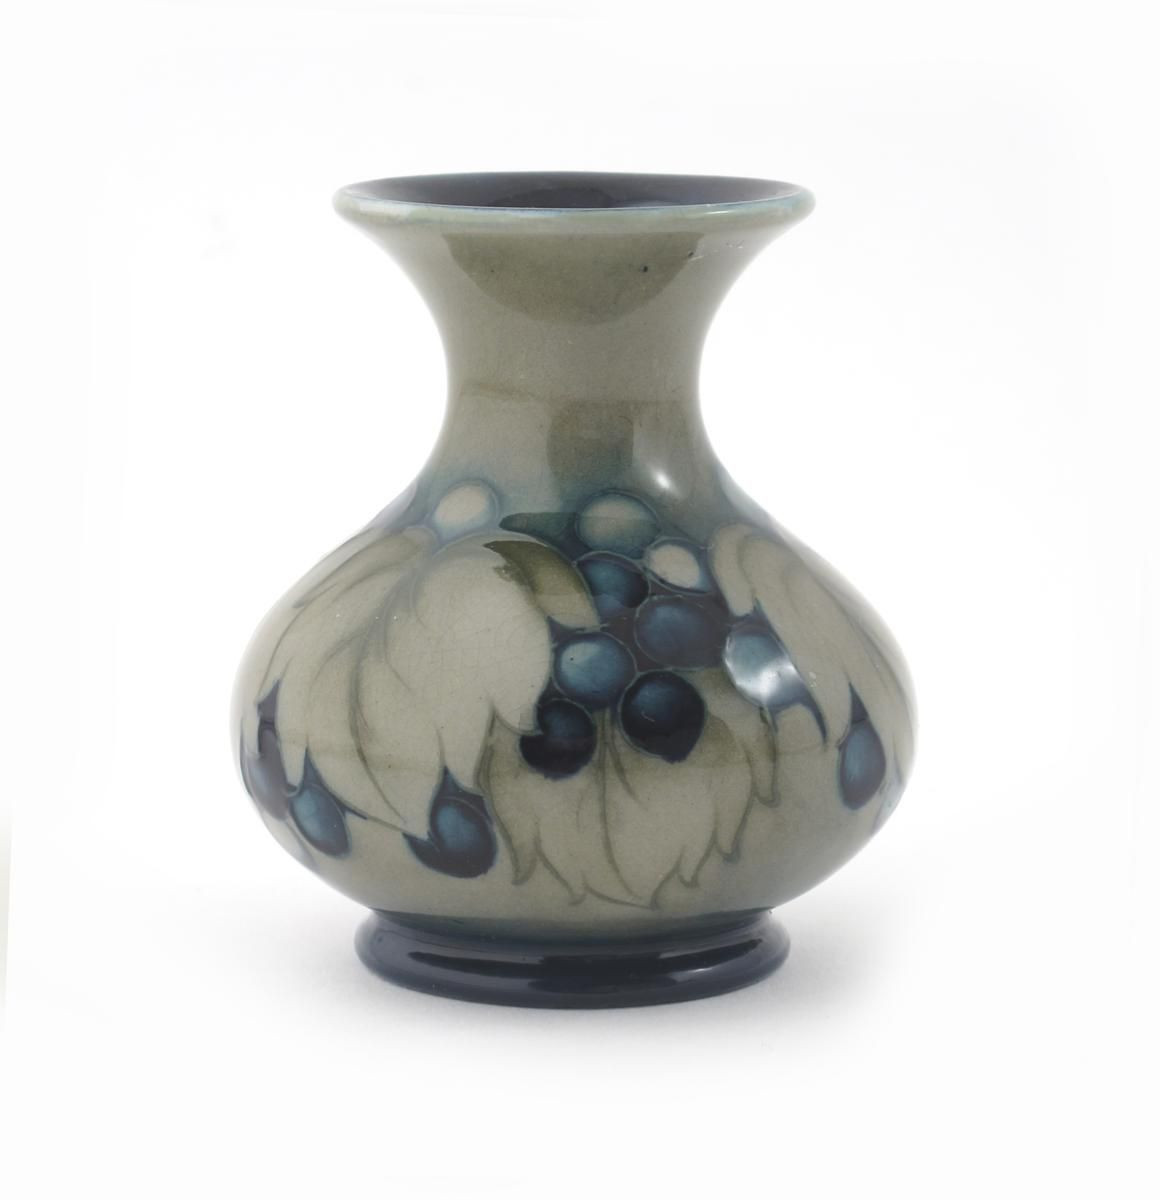 cobalt blue pottery vase of blue pottery vase image italian fine art pottery vase white and blue with blue pottery vase image leaf and berry a moorcroft pottery vase designed by william of blue